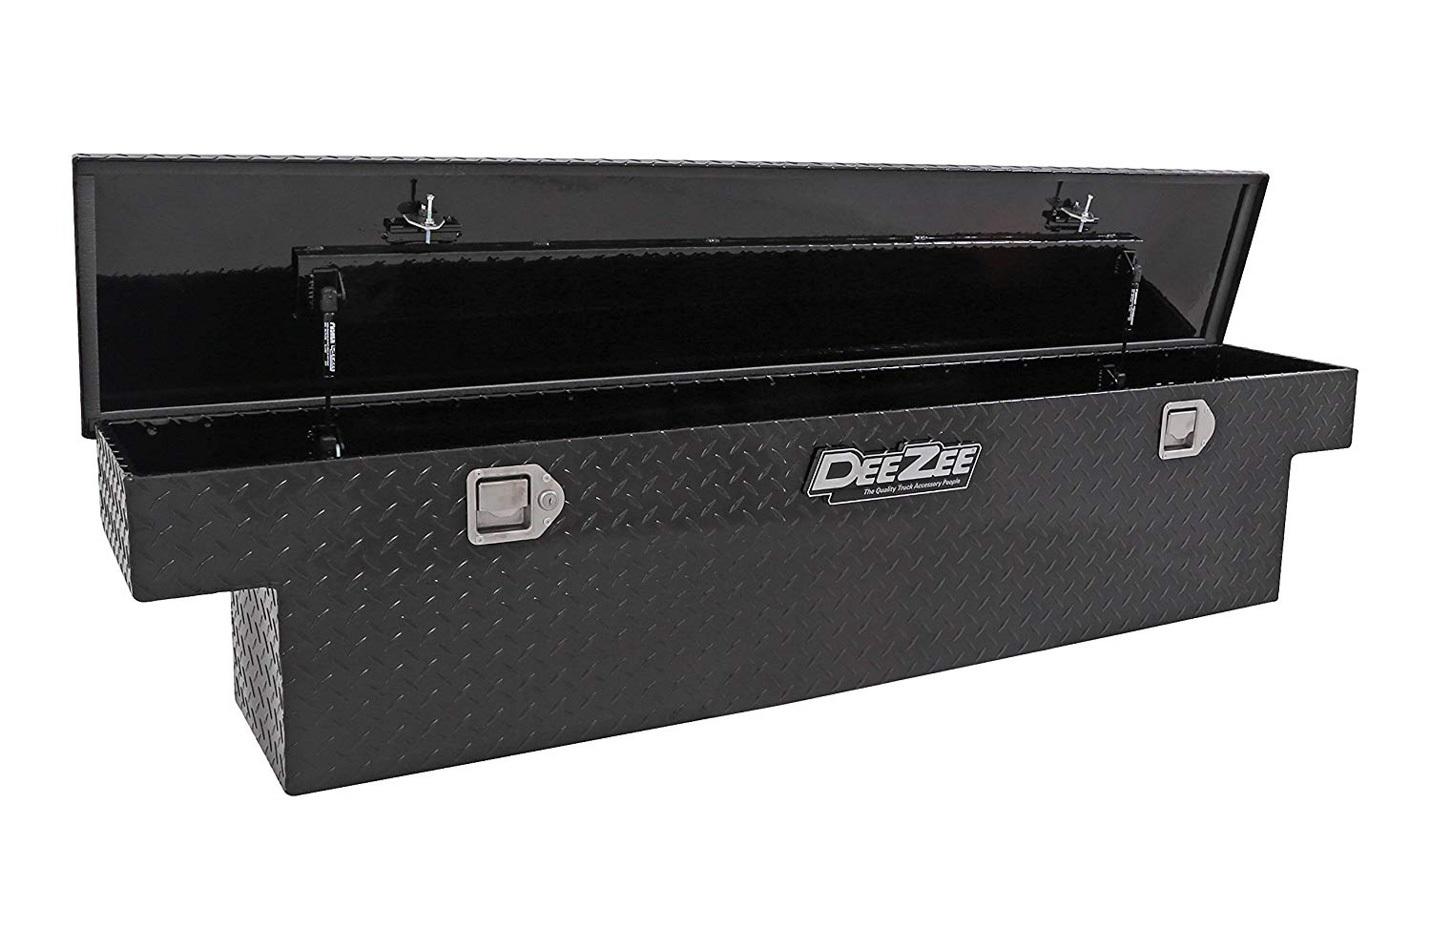 Tool Box - Specialty Nar row Black BT